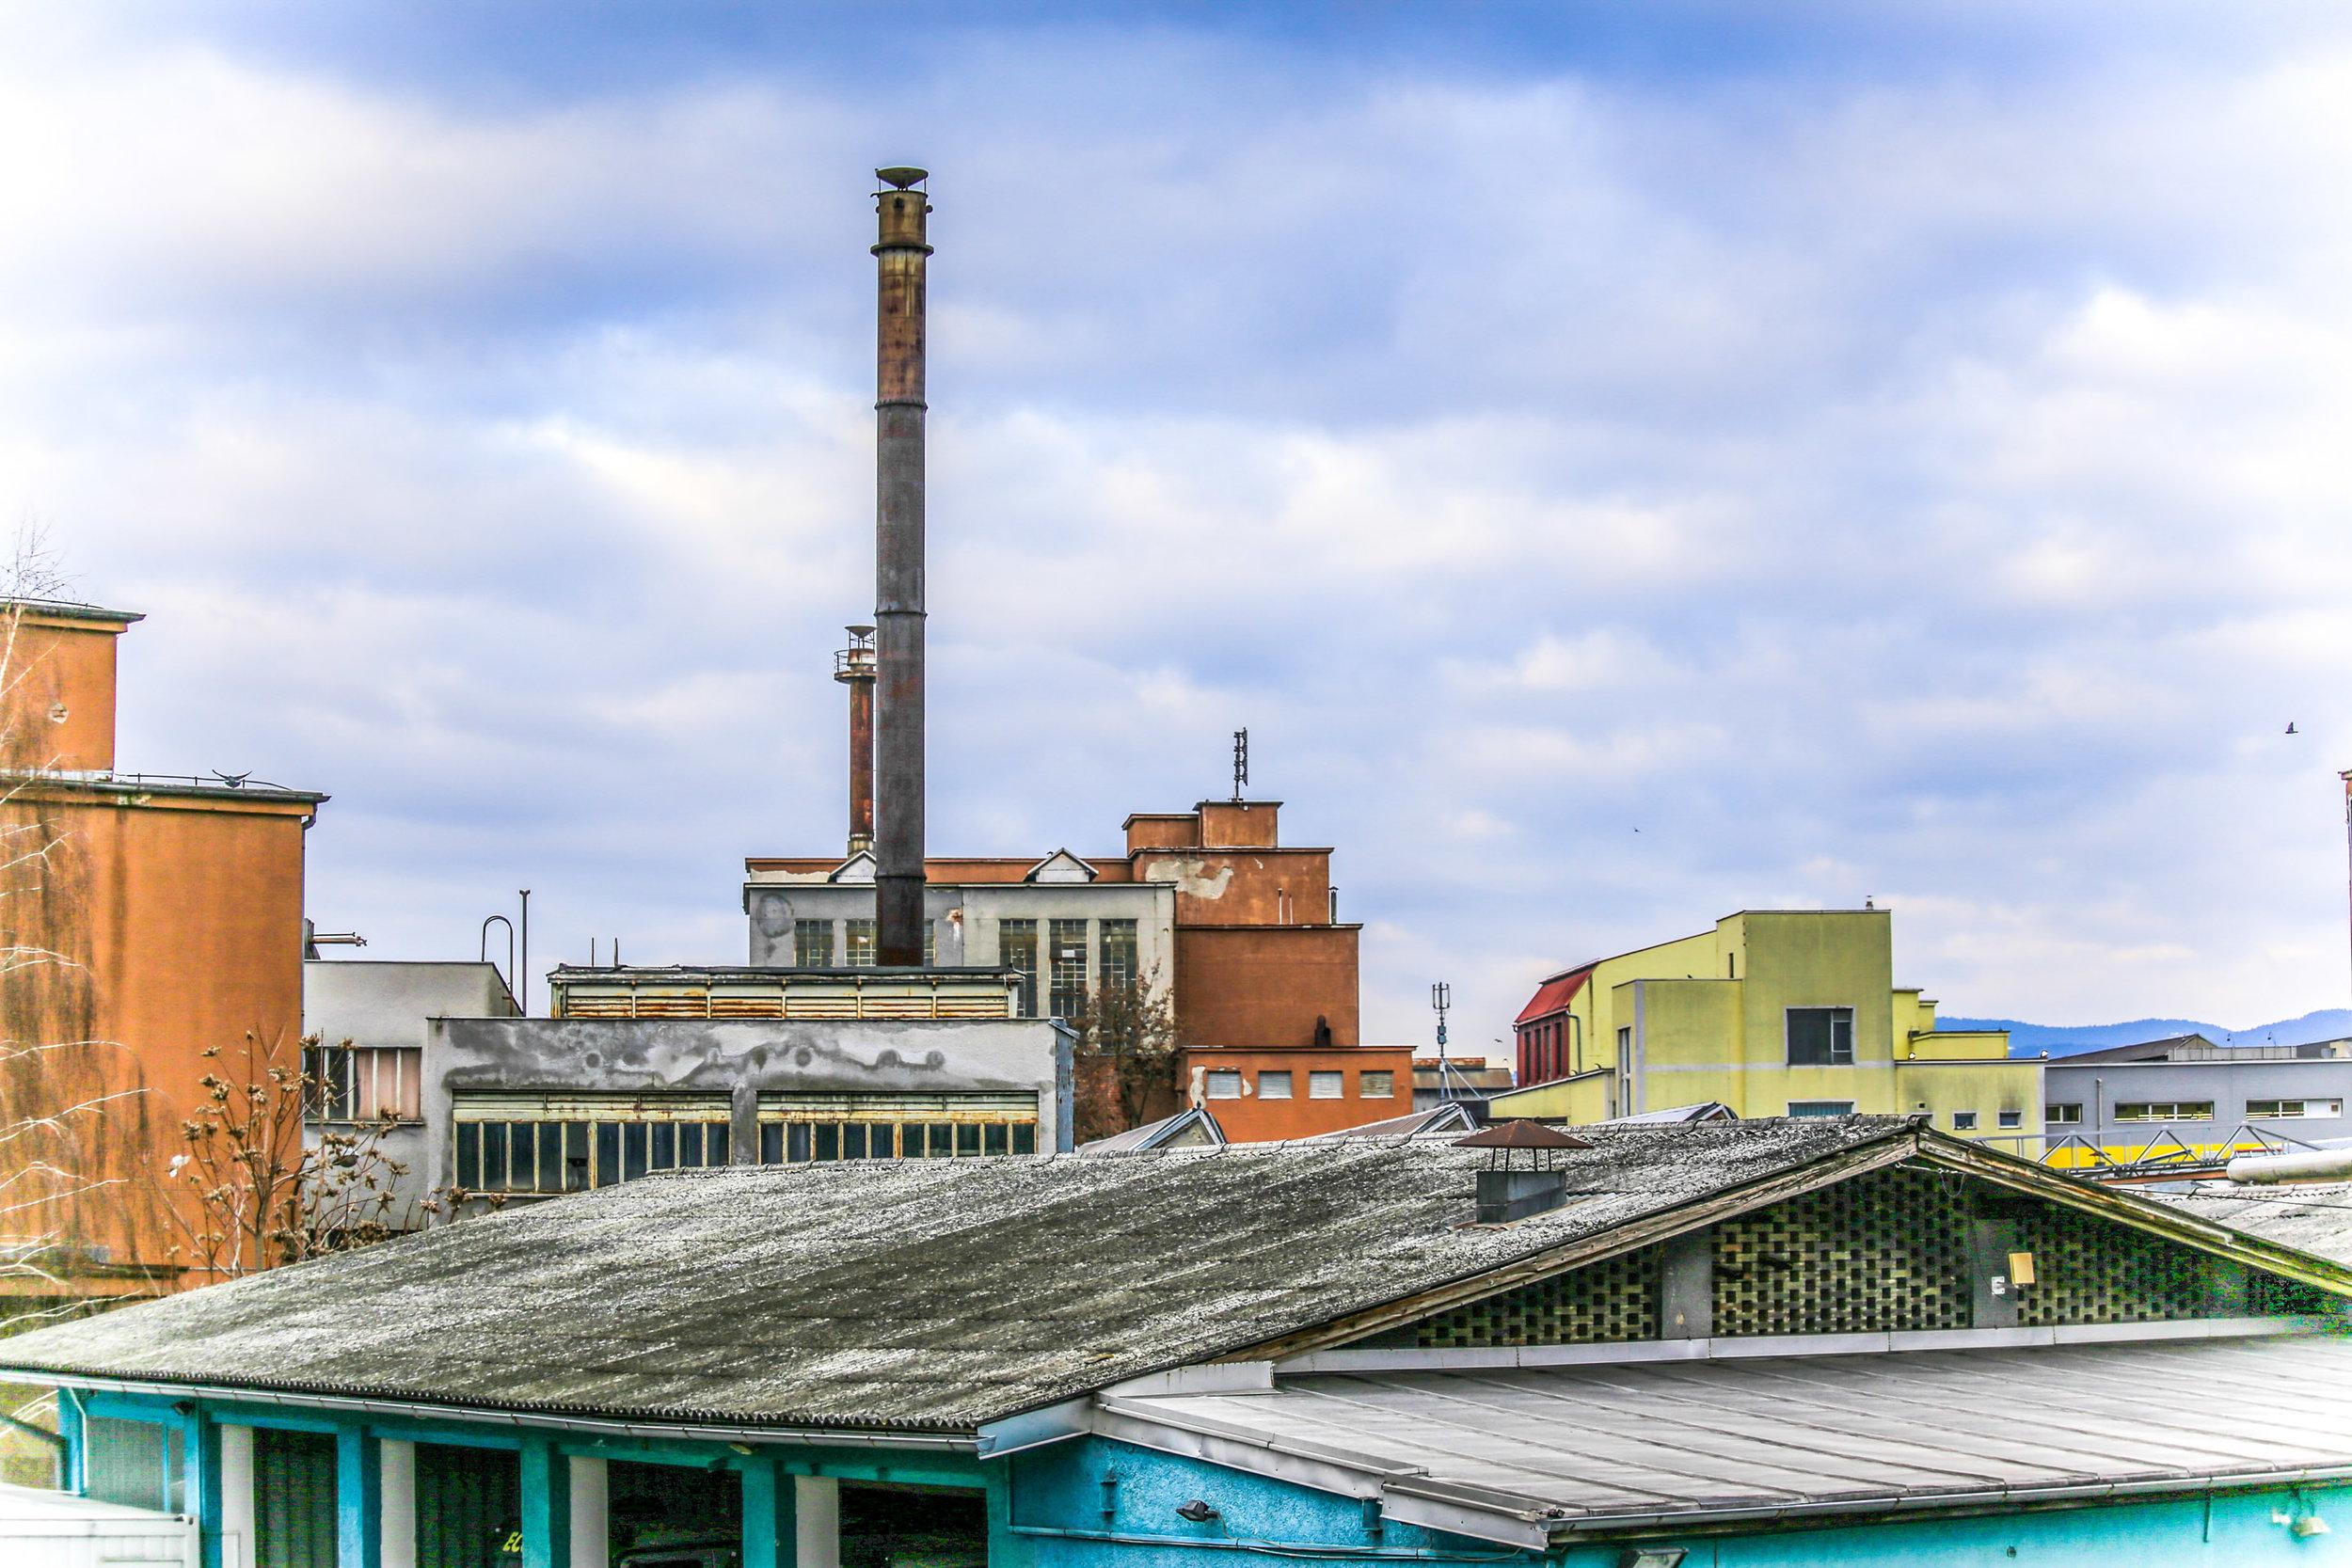 Foto: Igor Unuk - Melje industry